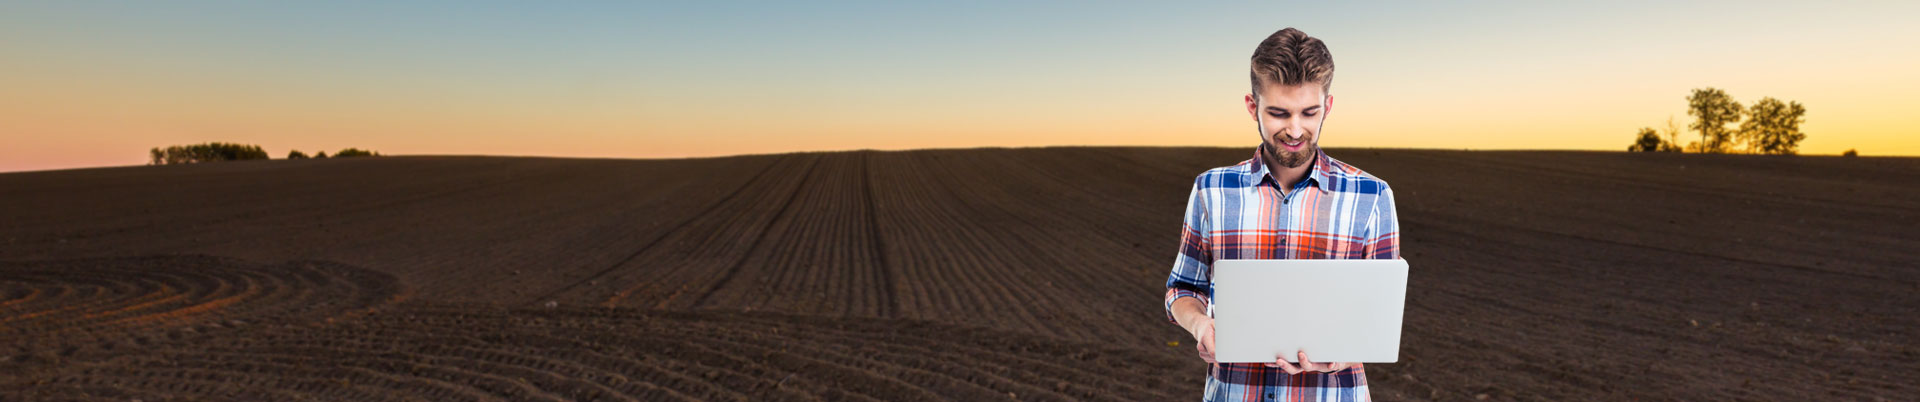 Agriculture Land Management Software Development